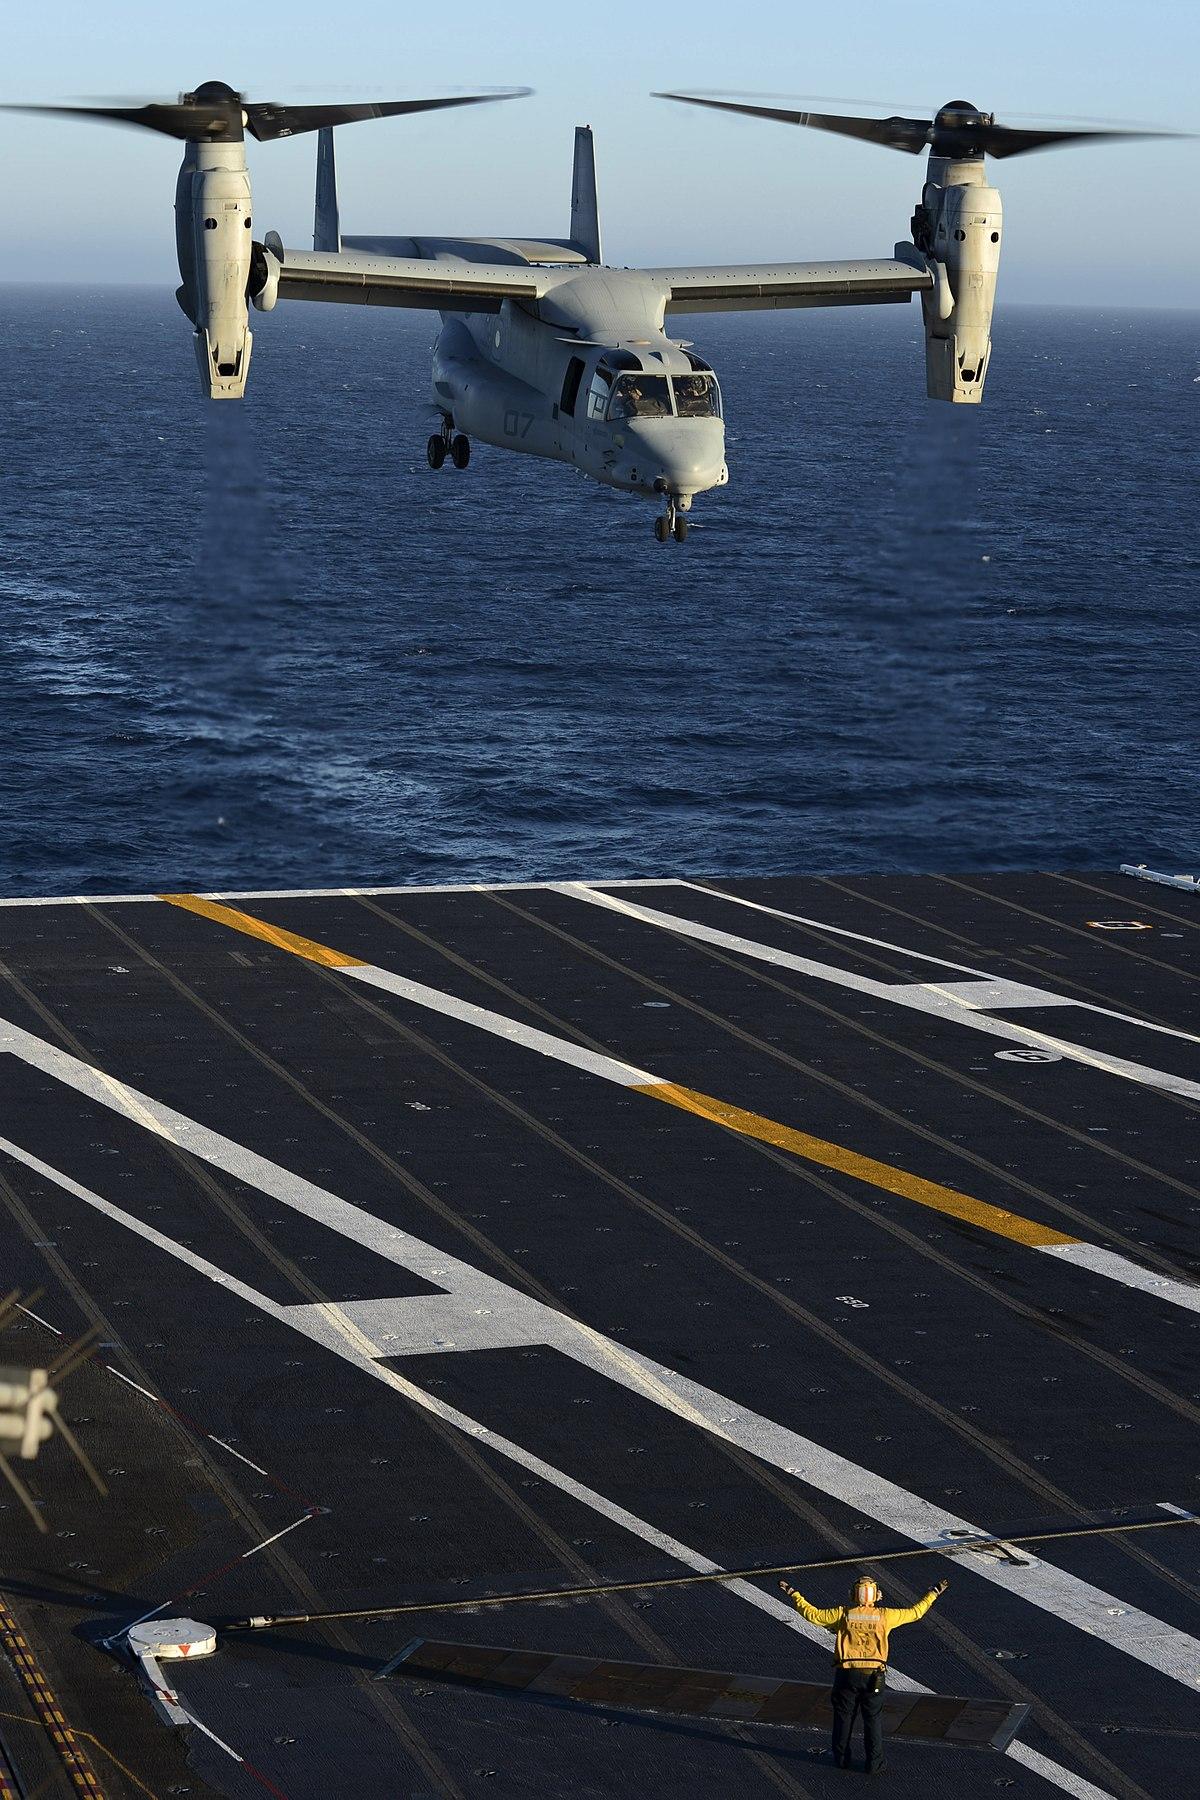 MV-22 Osprey on USS Nimitz (CVN-68) (121006-N-LP801-082).jpg